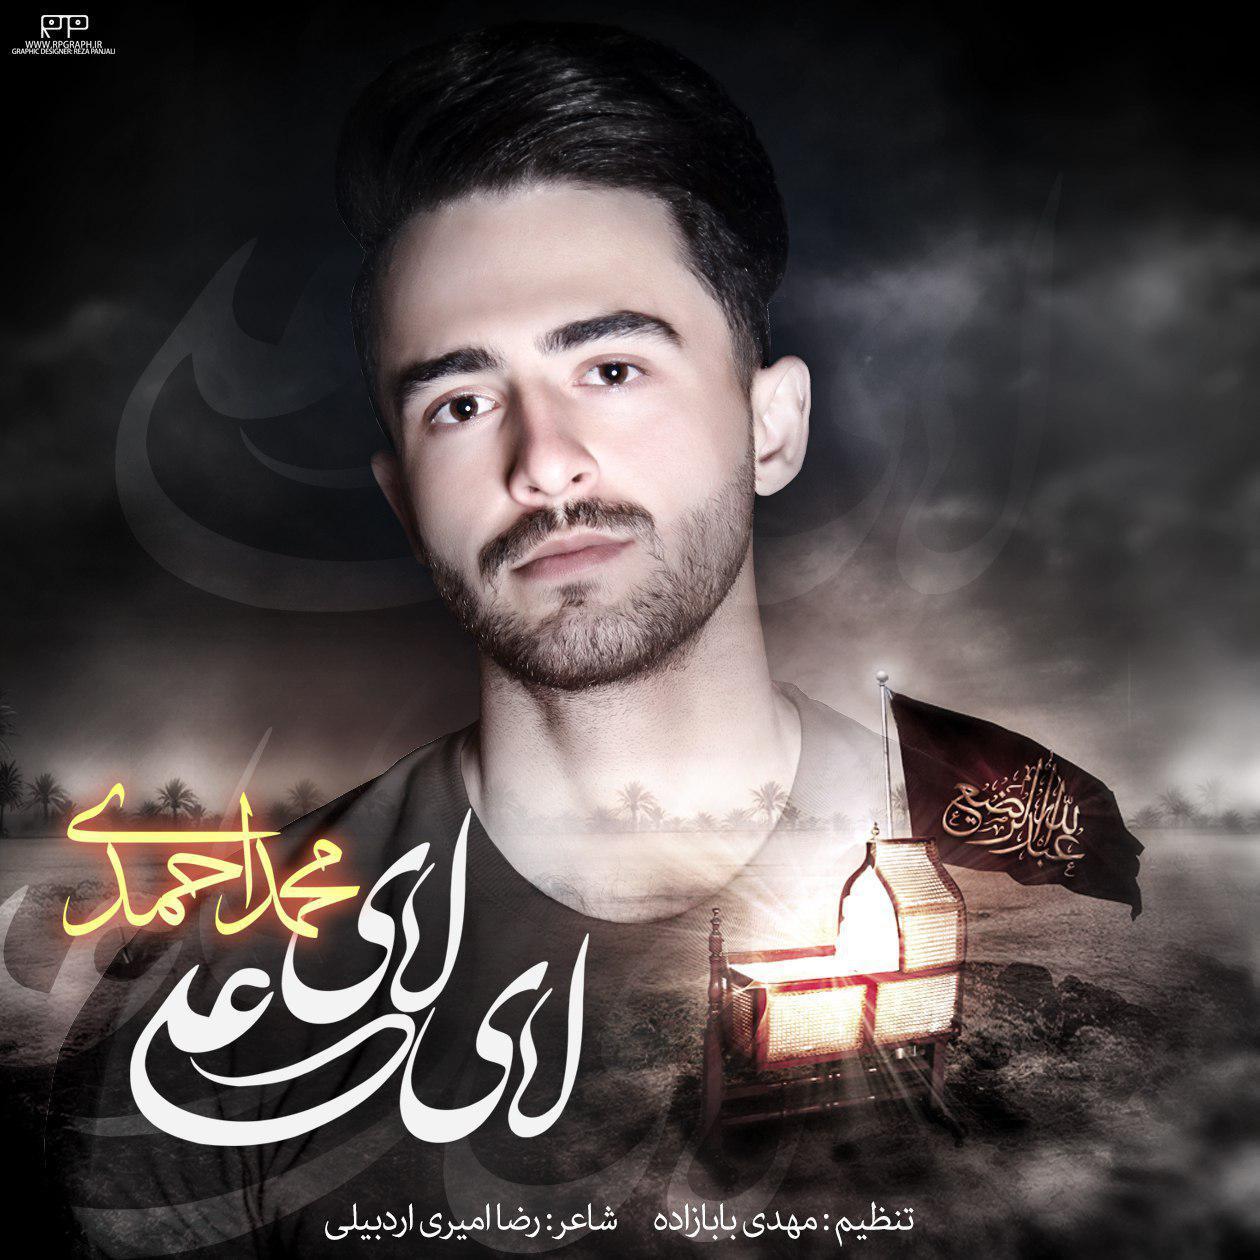 http://s4.picofile.com/file/8372203334/04Mohamad_Ahmadi_Lay_Lay.jpg